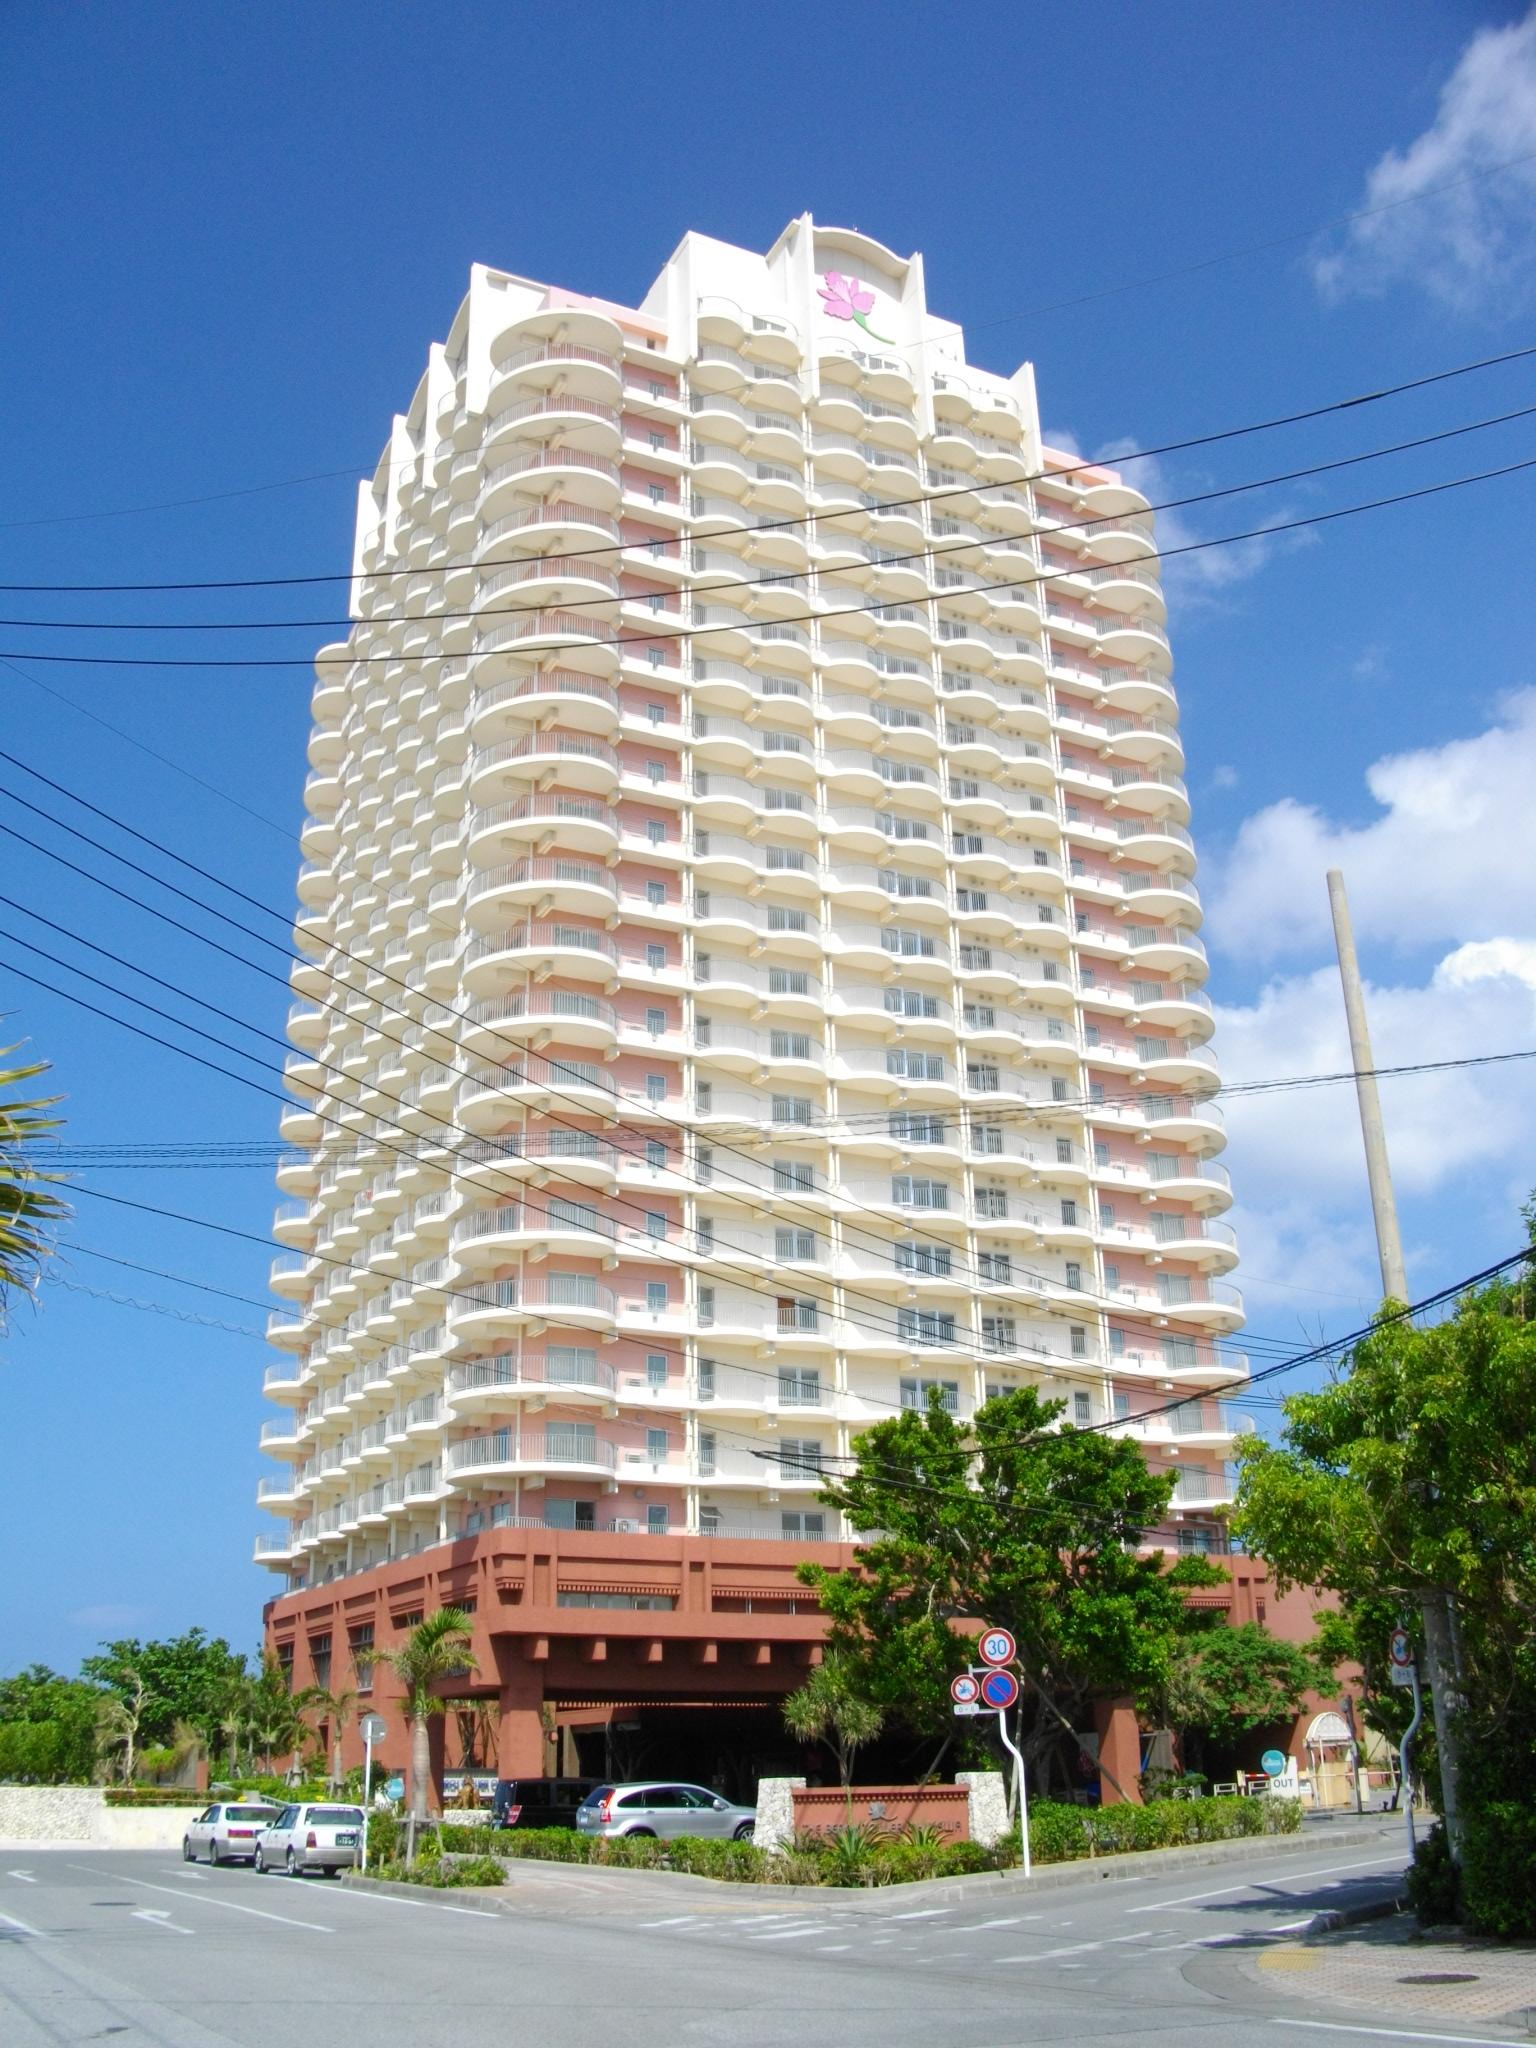 Beach Tower Hotel Panama City Beach Florida